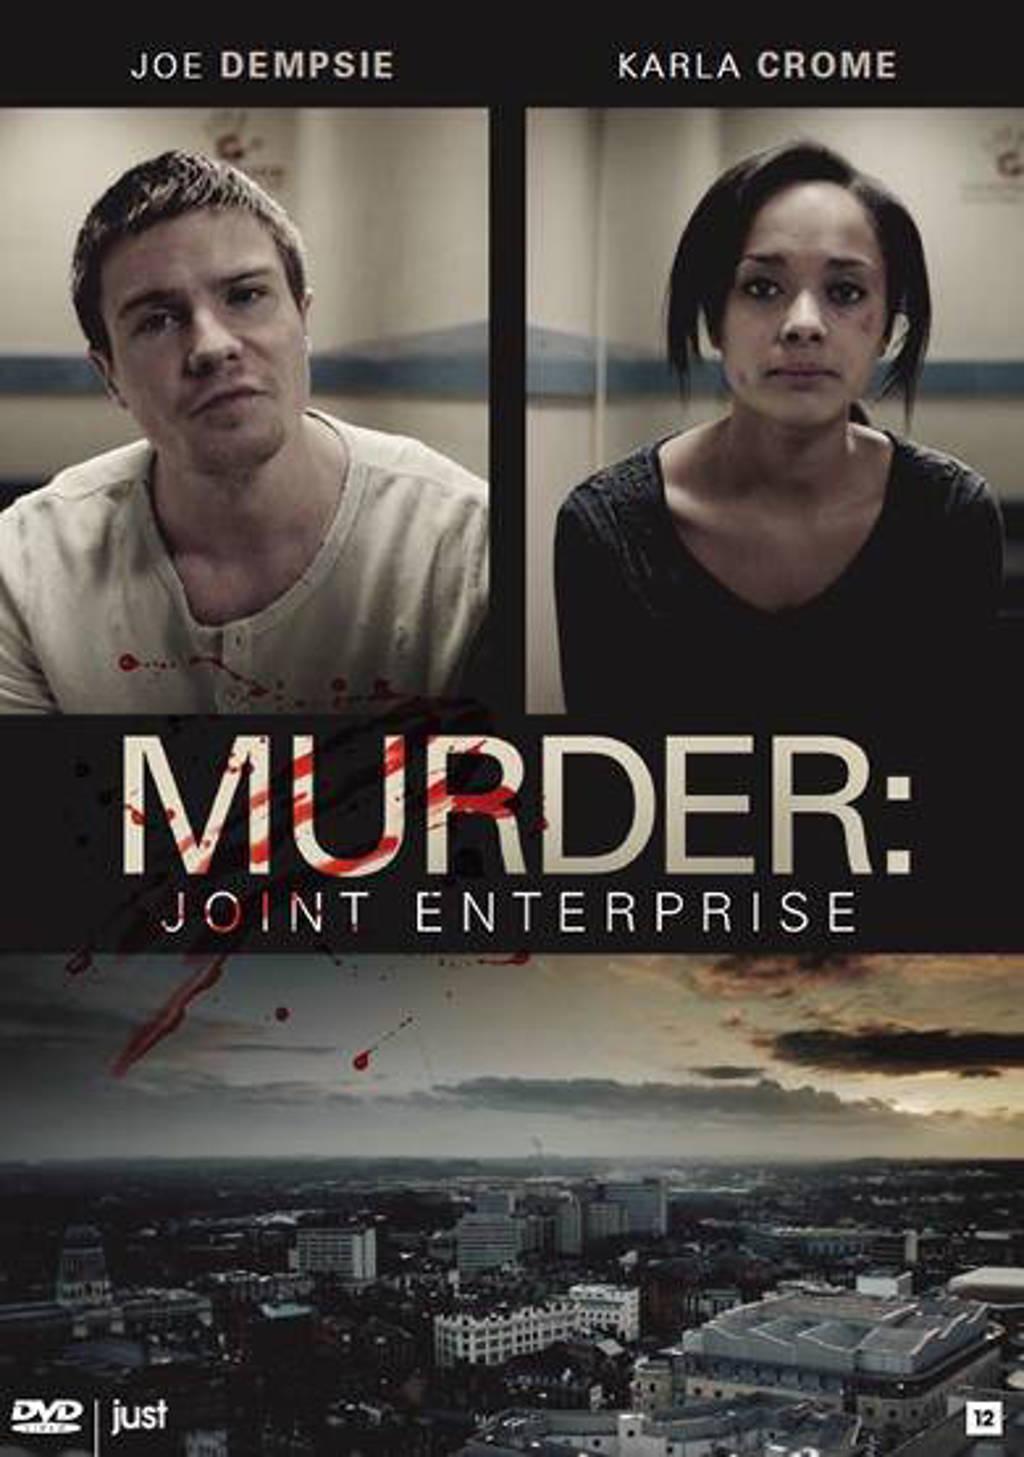 Murder - Joint enterprise (DVD)